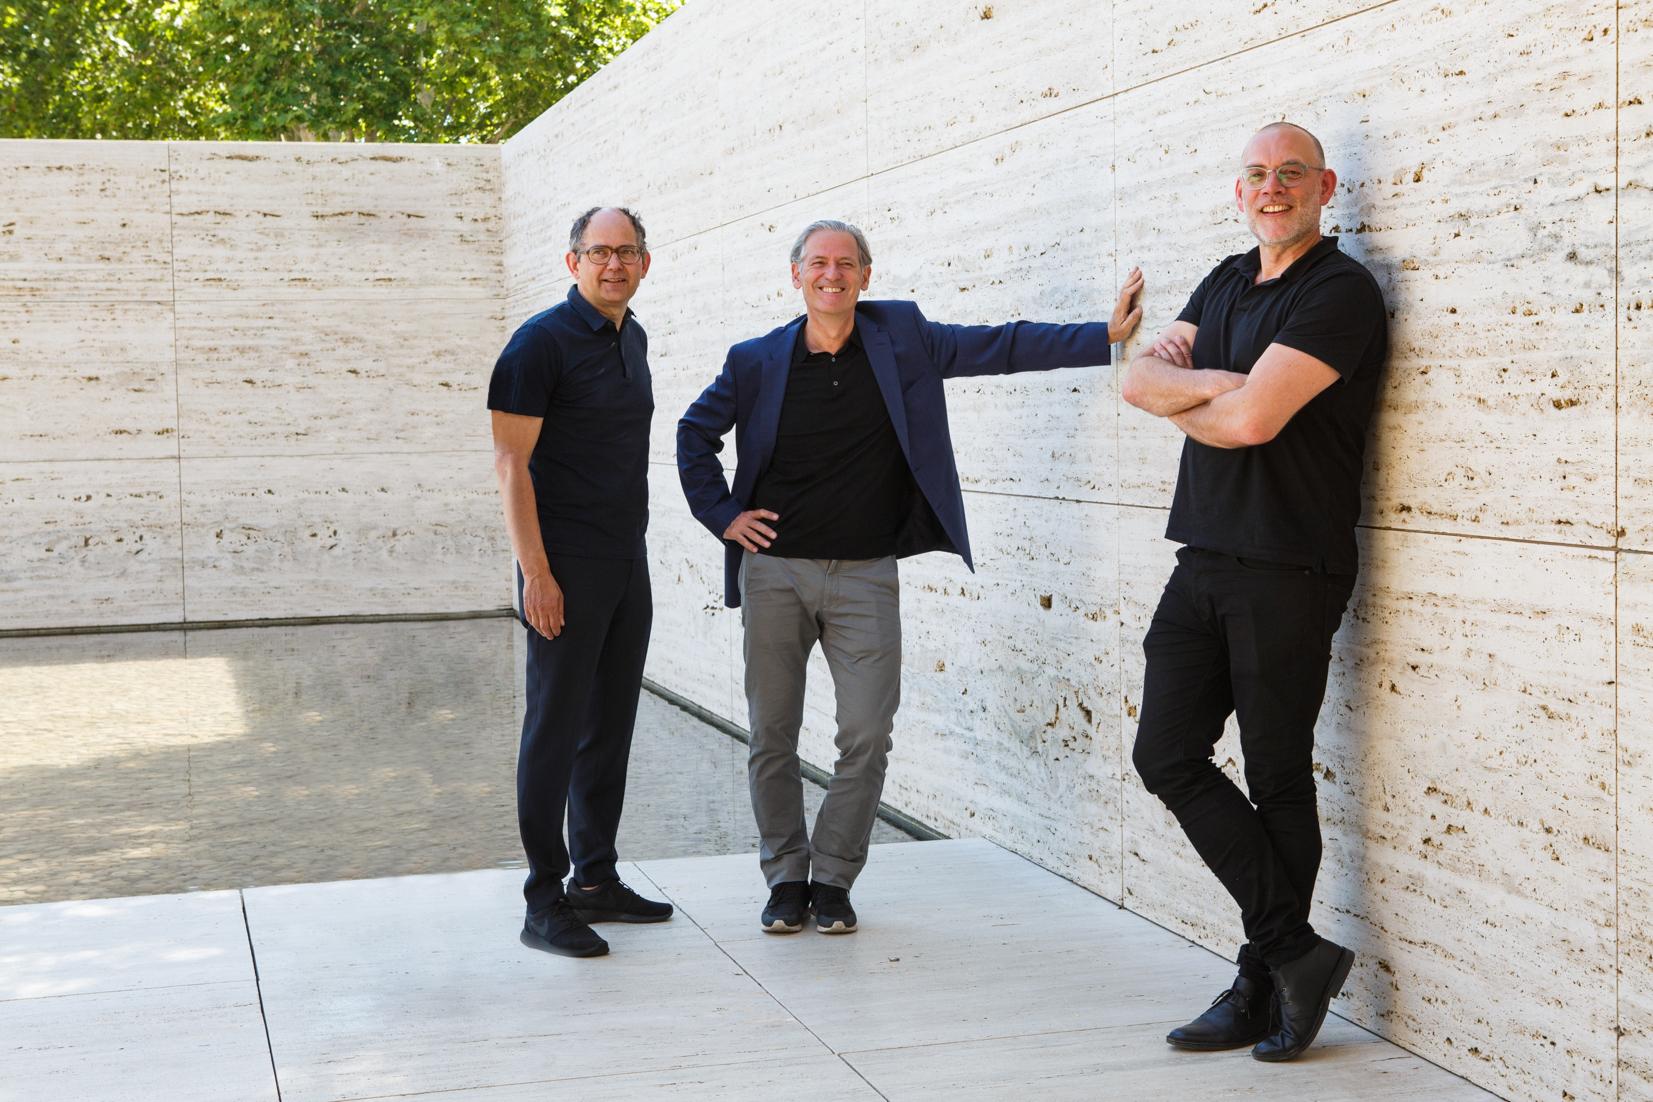 NL Architects - Pieter Bannenberg, Walter van Dijk, Kamiel Klaasse